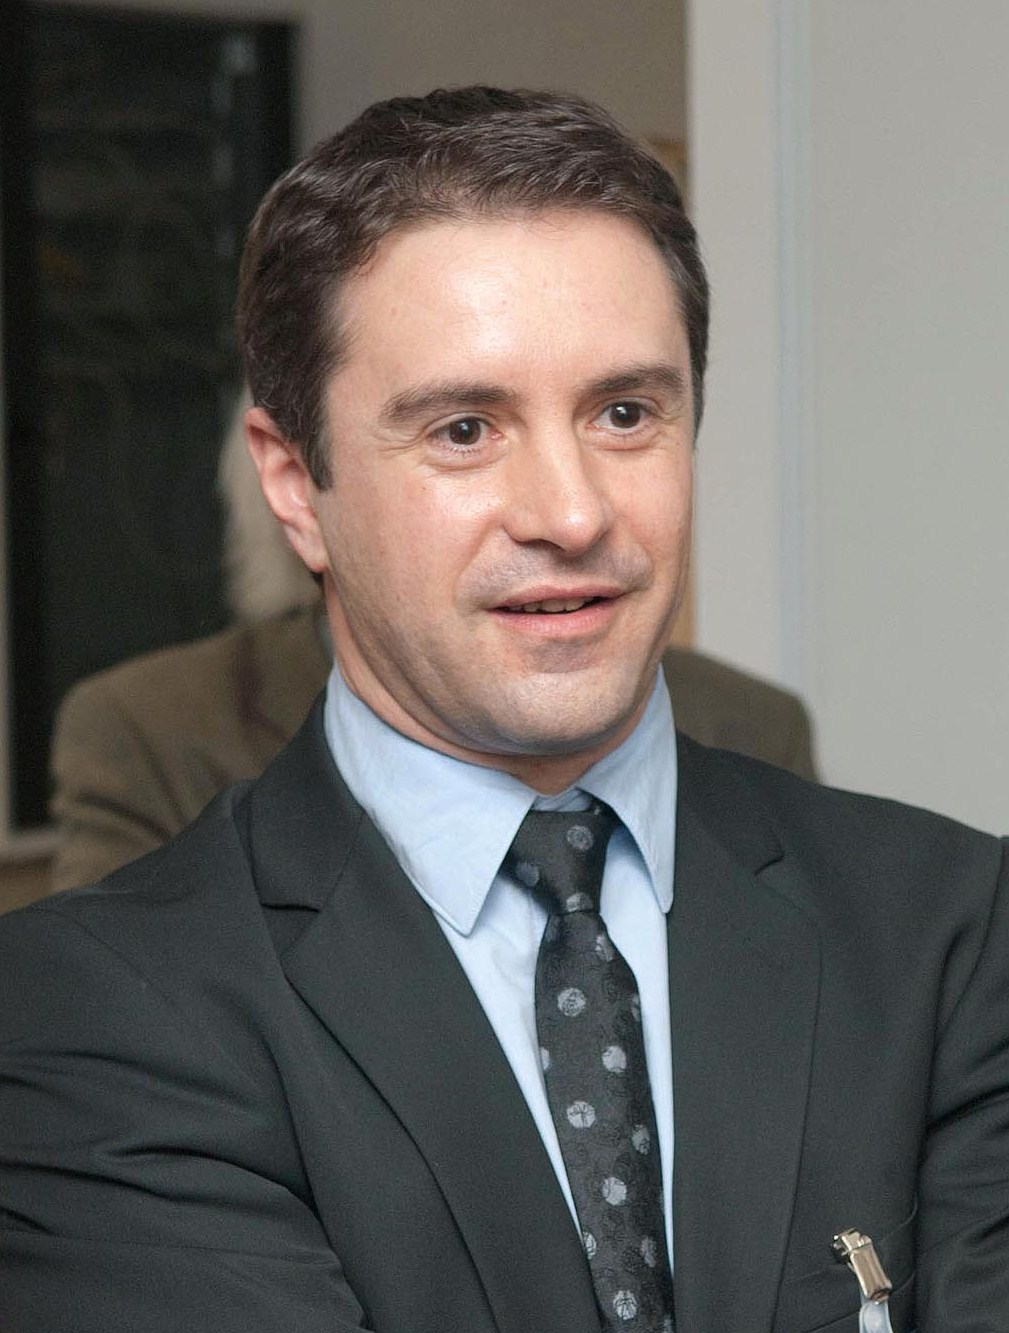 Pierre Lapoujade